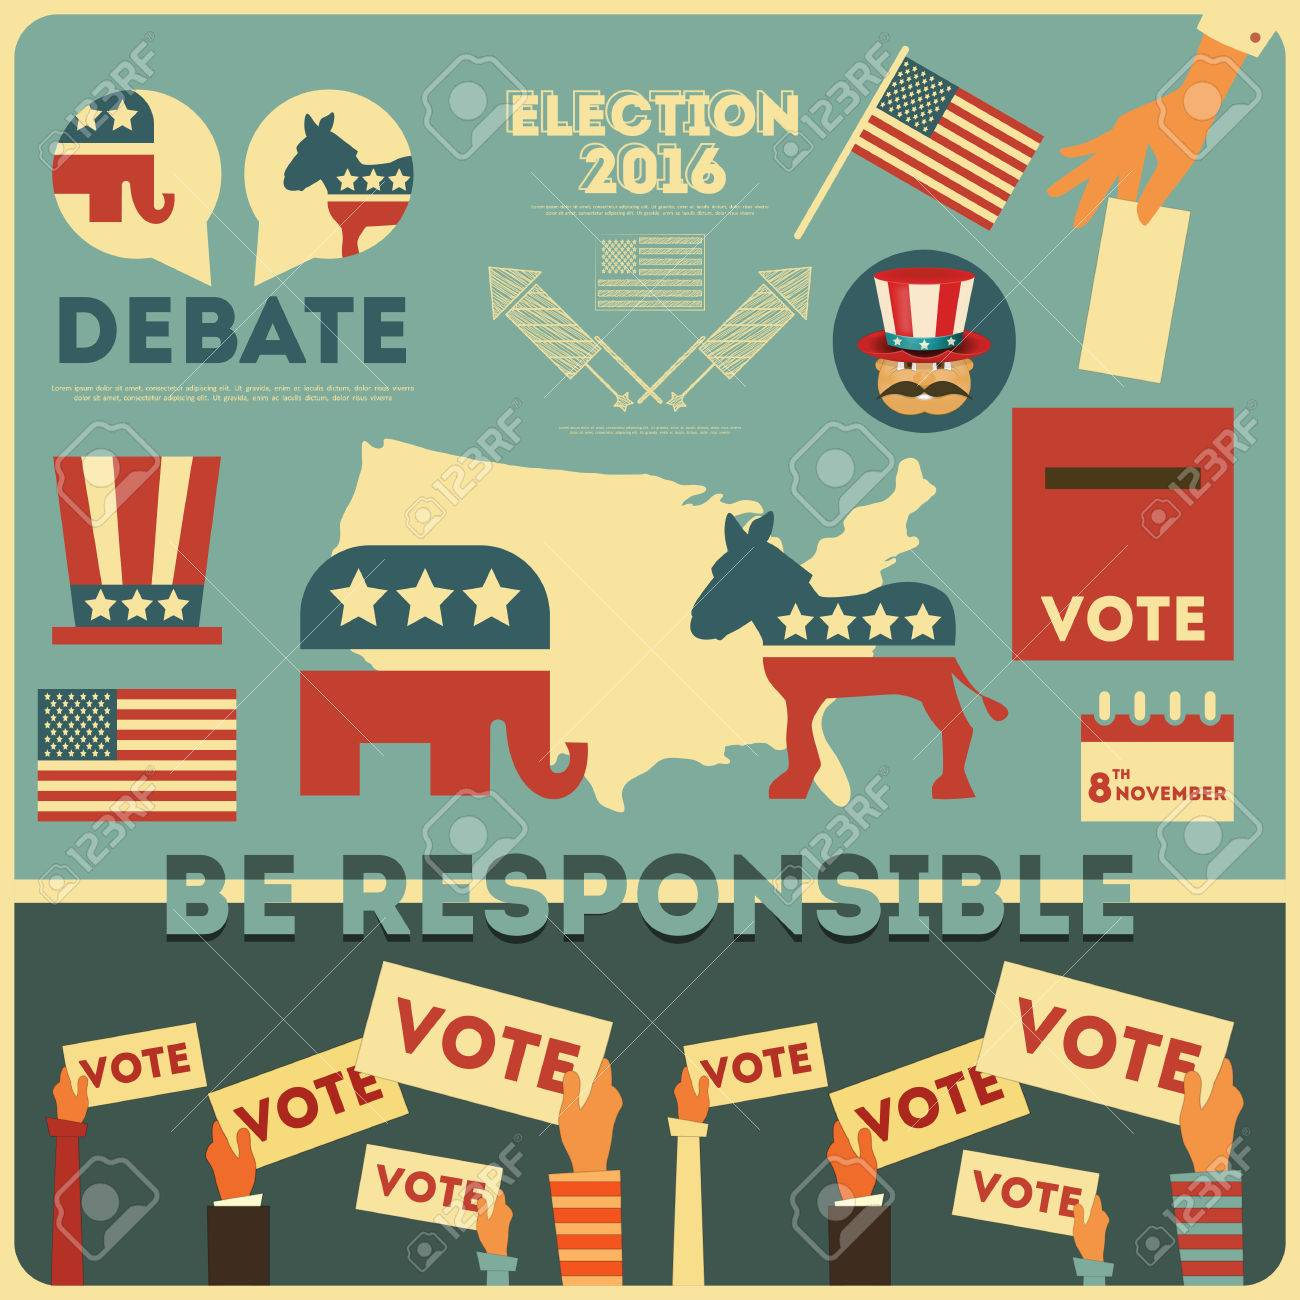 Presidential Election Voting Elements. Illustration. - 52223817